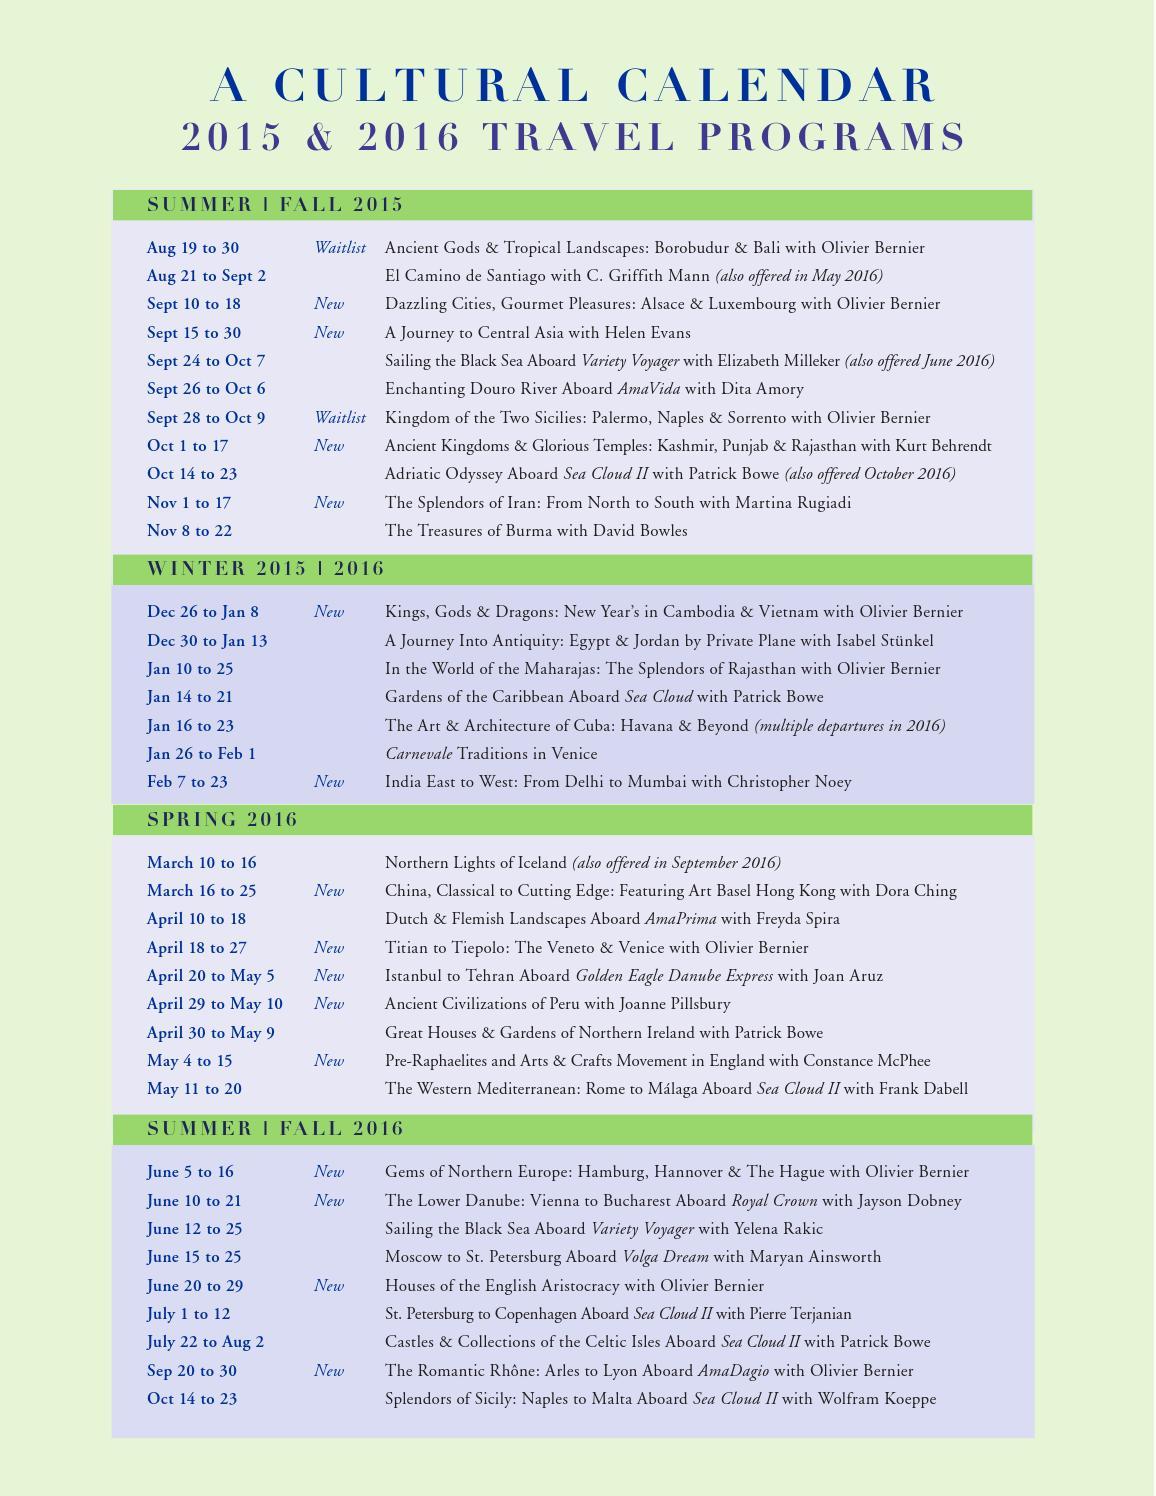 Rajasthan Calendar June : Cultural calendar june by academicarrangementsabroad